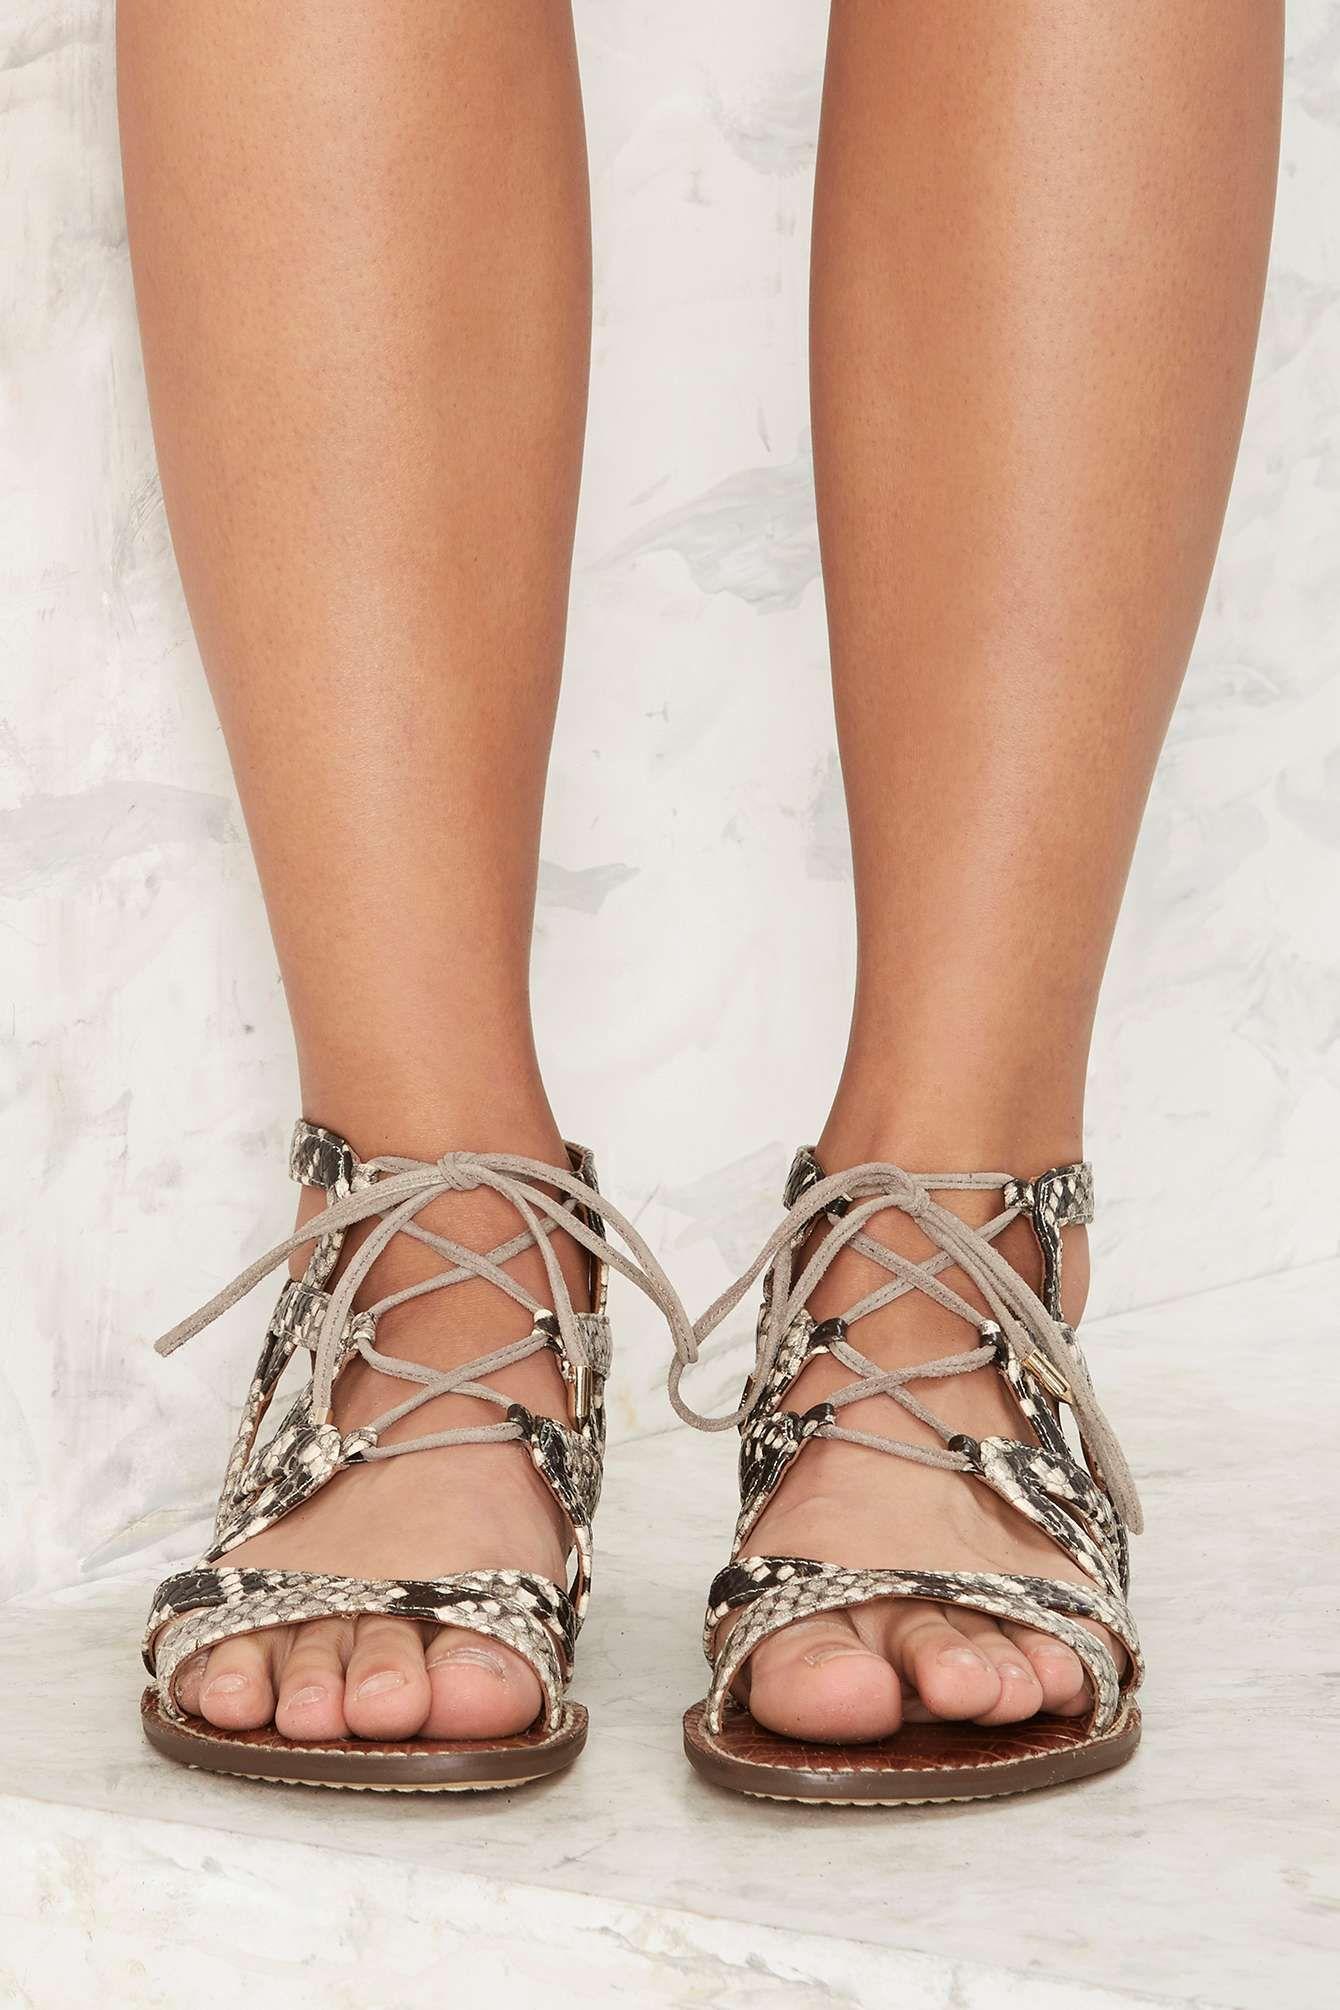 quality design 8ca5d 1439f Sam Edelman Gemma Gladiator Sandal | Shop Shoes at Nasty Gal ...